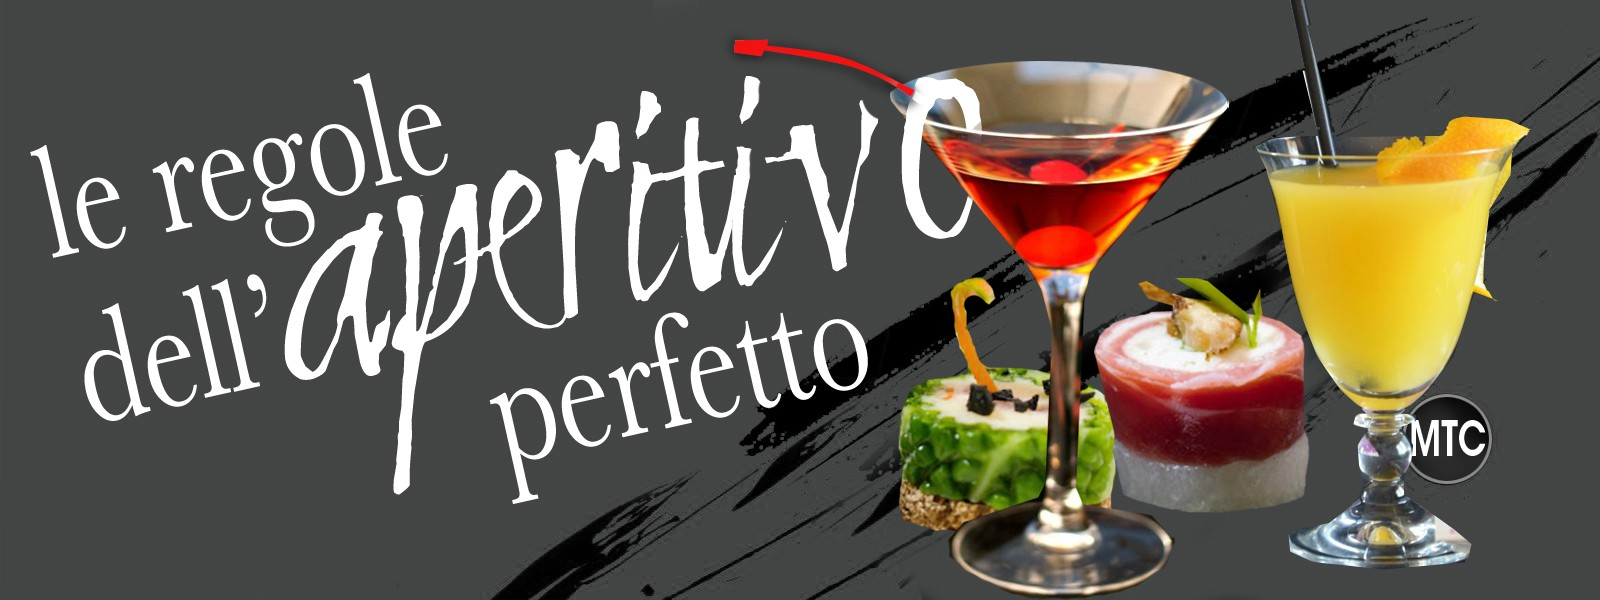 MASTRO_aperitivo_perfettoBIS